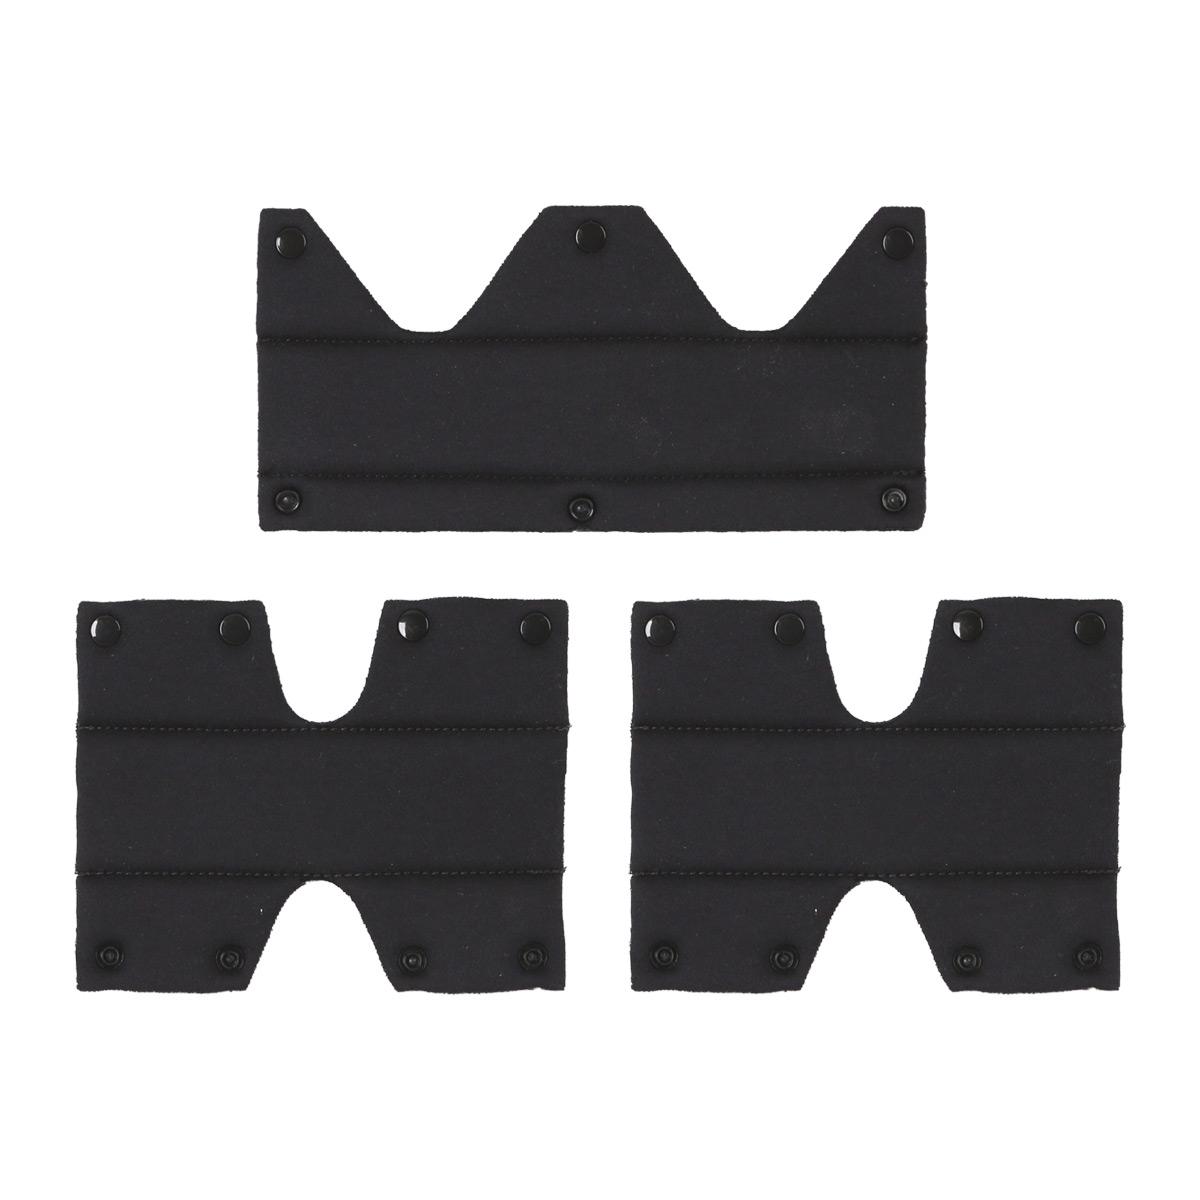 Premium Head Lining Kit (1 Brow Pad And 2 Nape Pads)